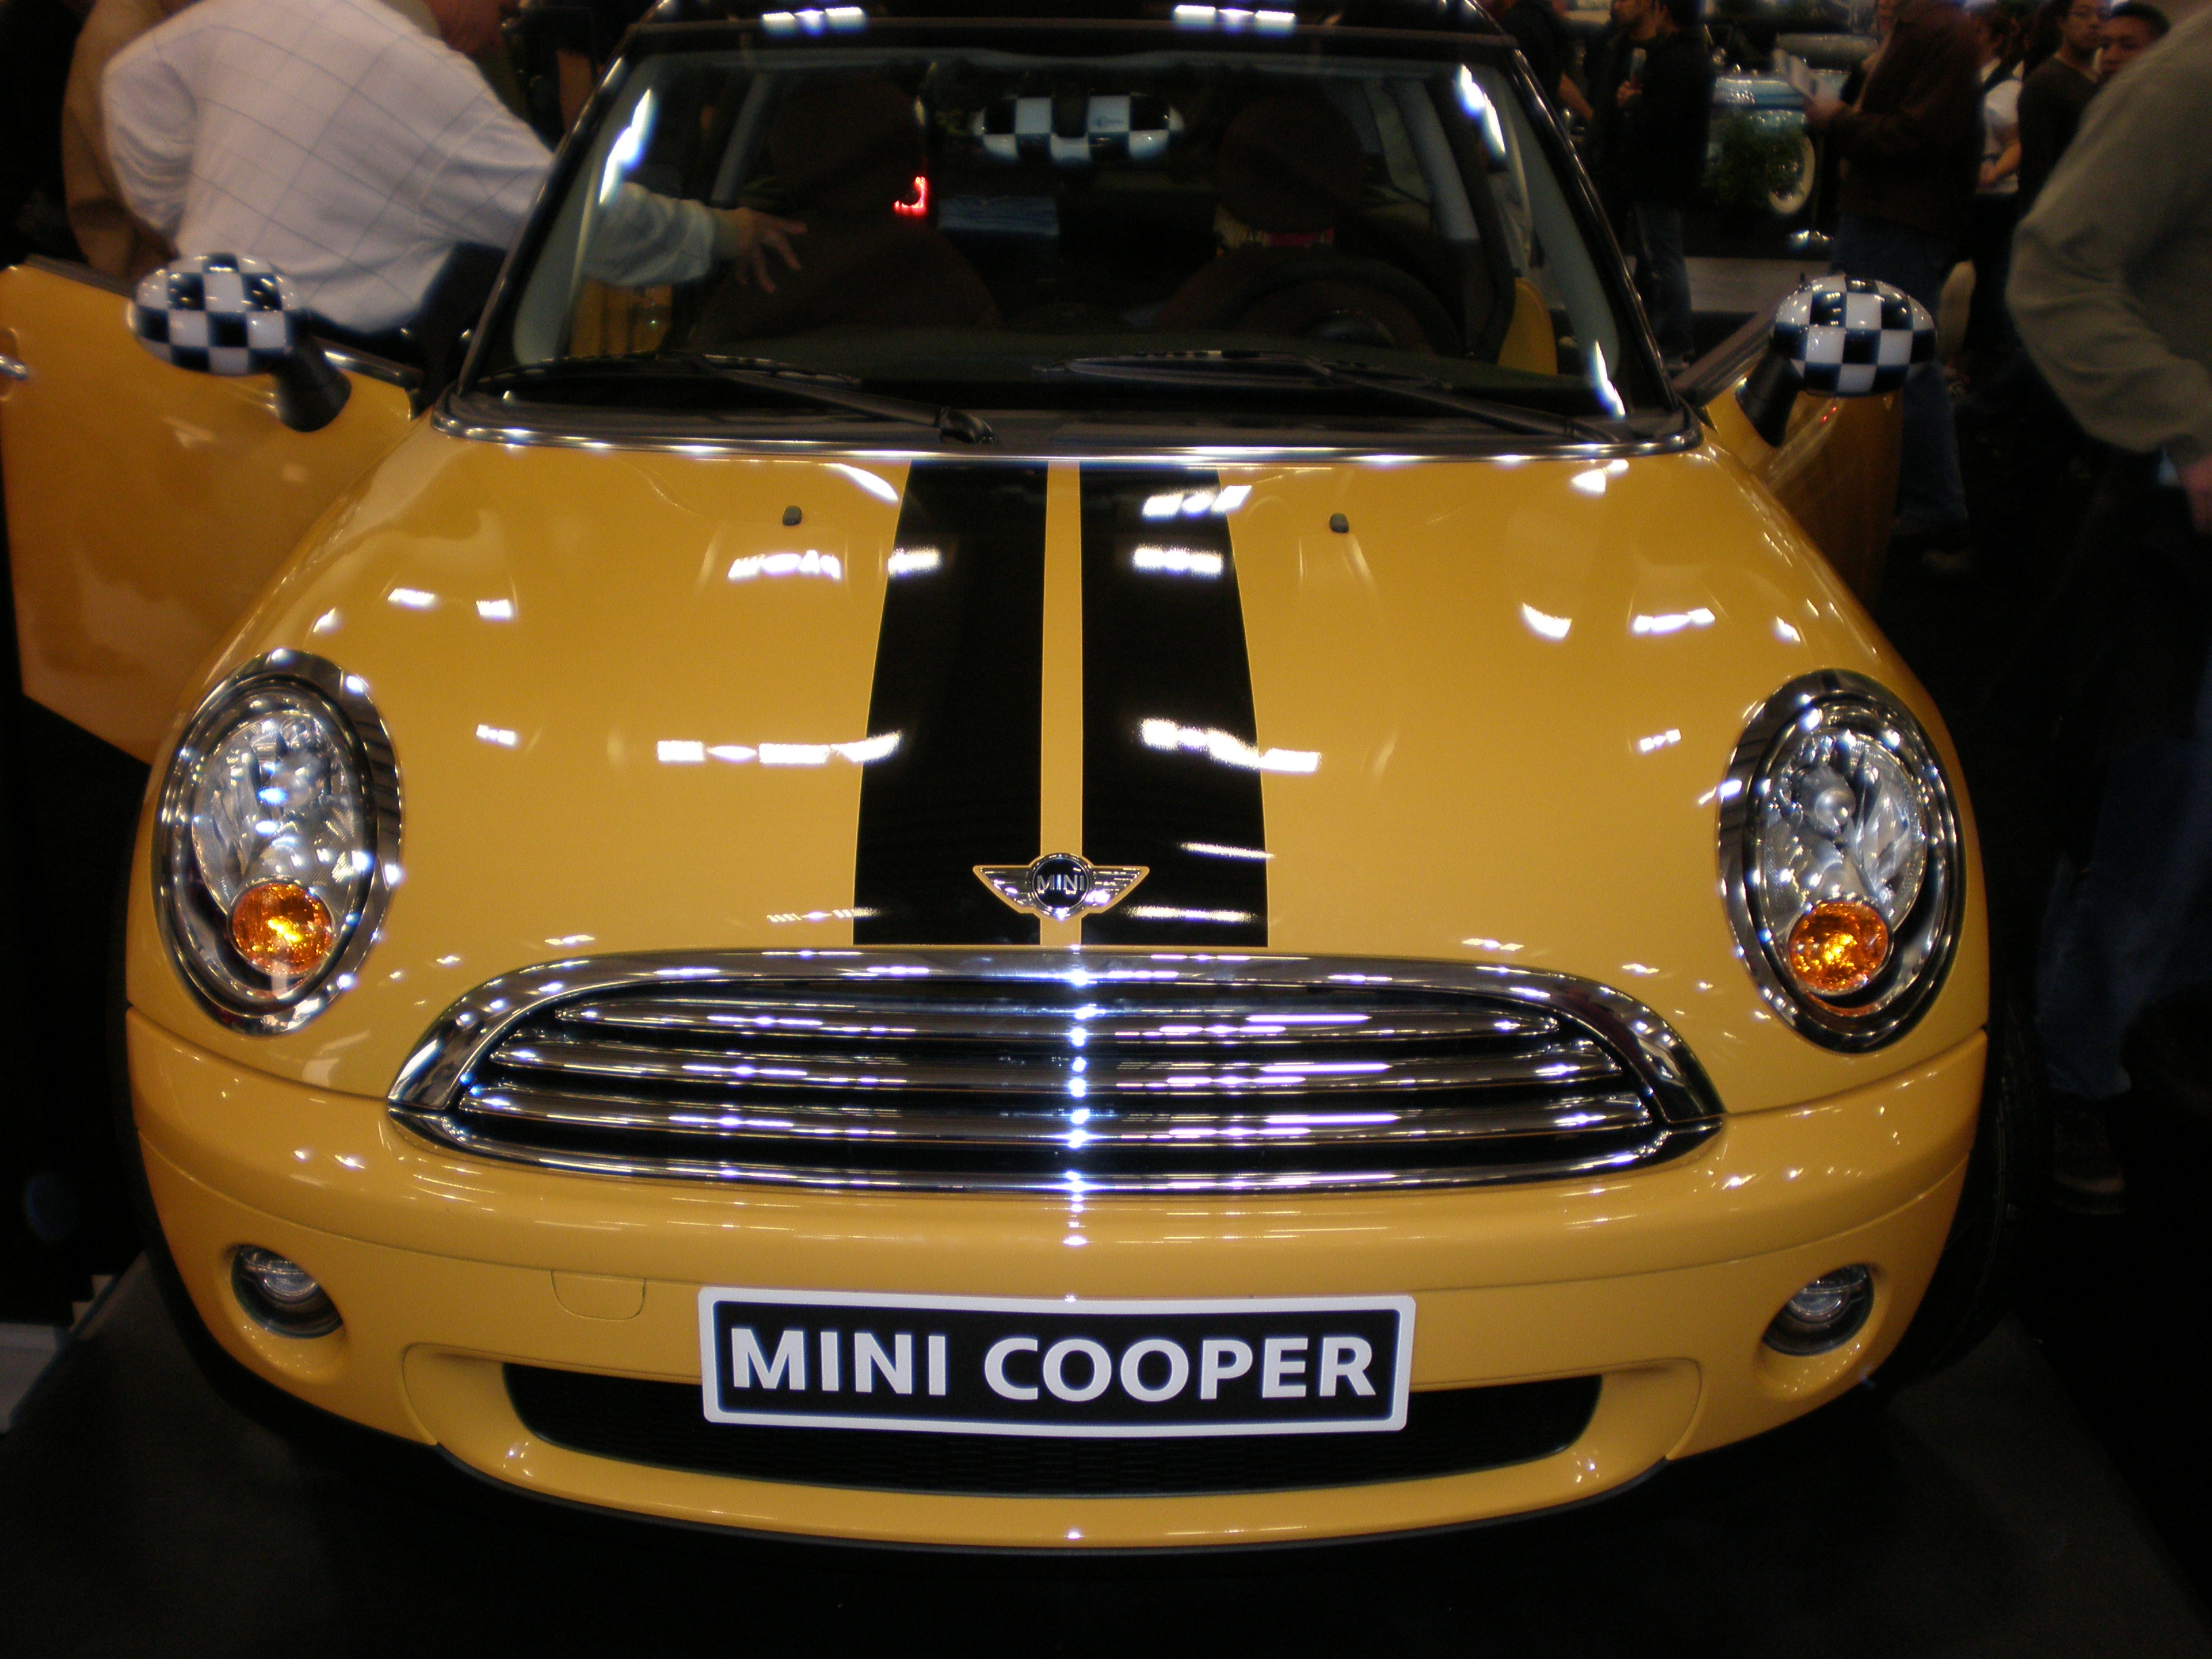 Mini Cooper Used Cars For Sale Uk